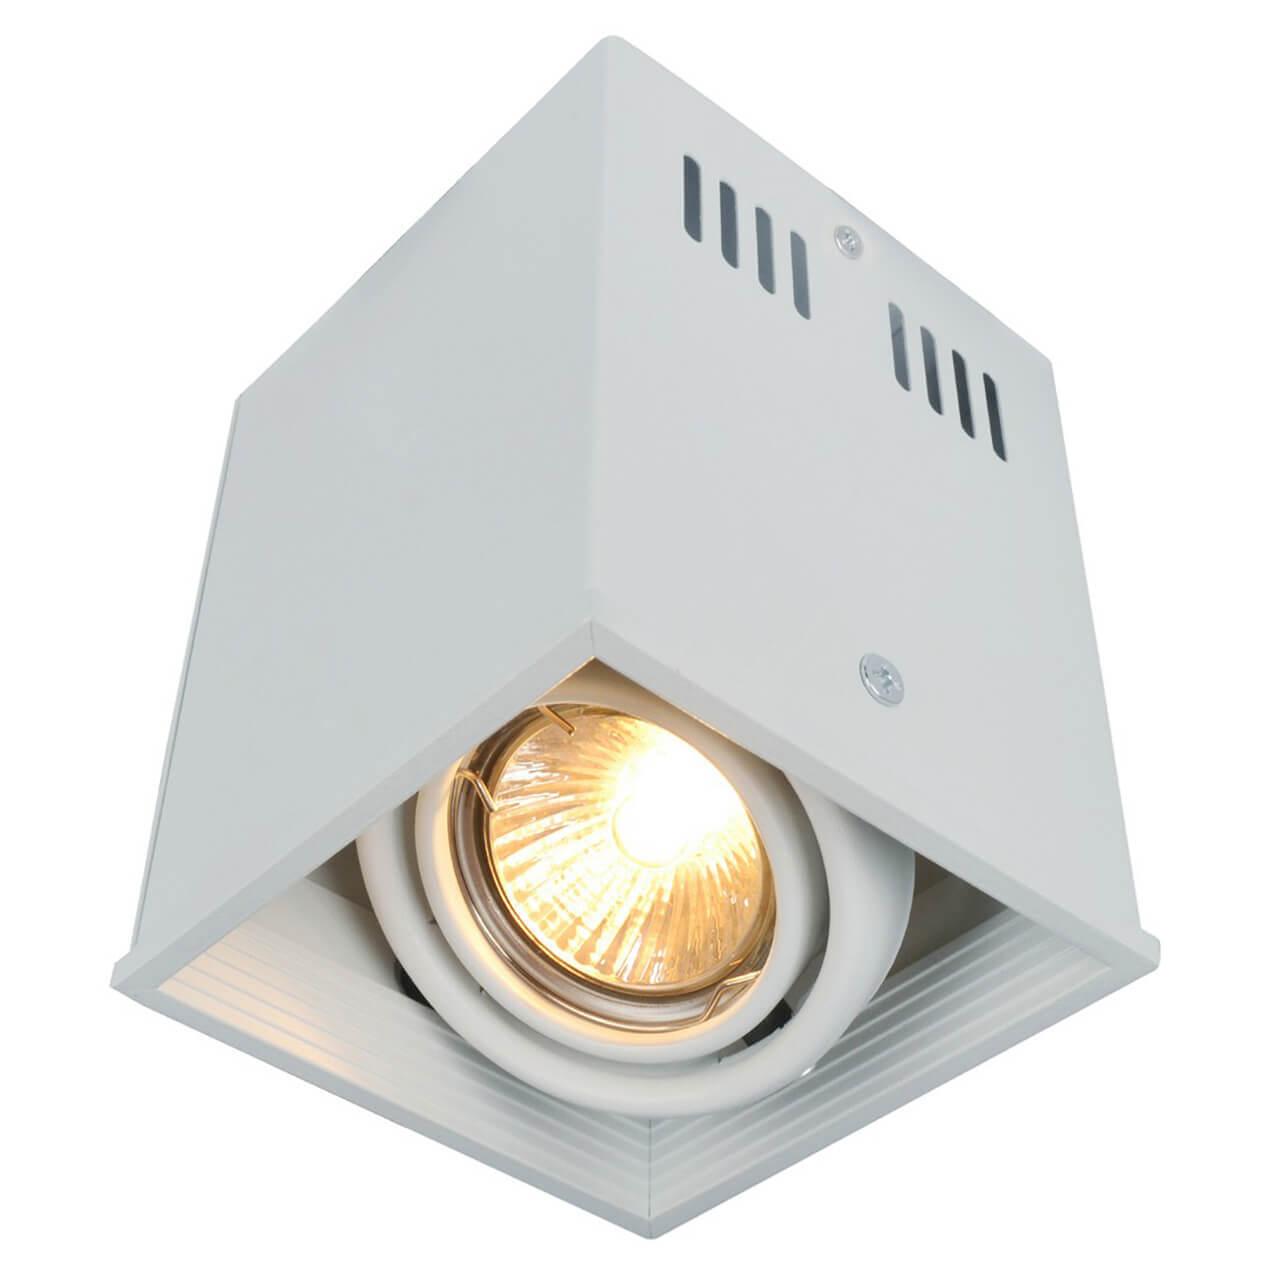 Светильник Arte Lamp A5942PL-1WH Cardani White потолочный светильник arte lamp cardani black арт a5936pl 1bk